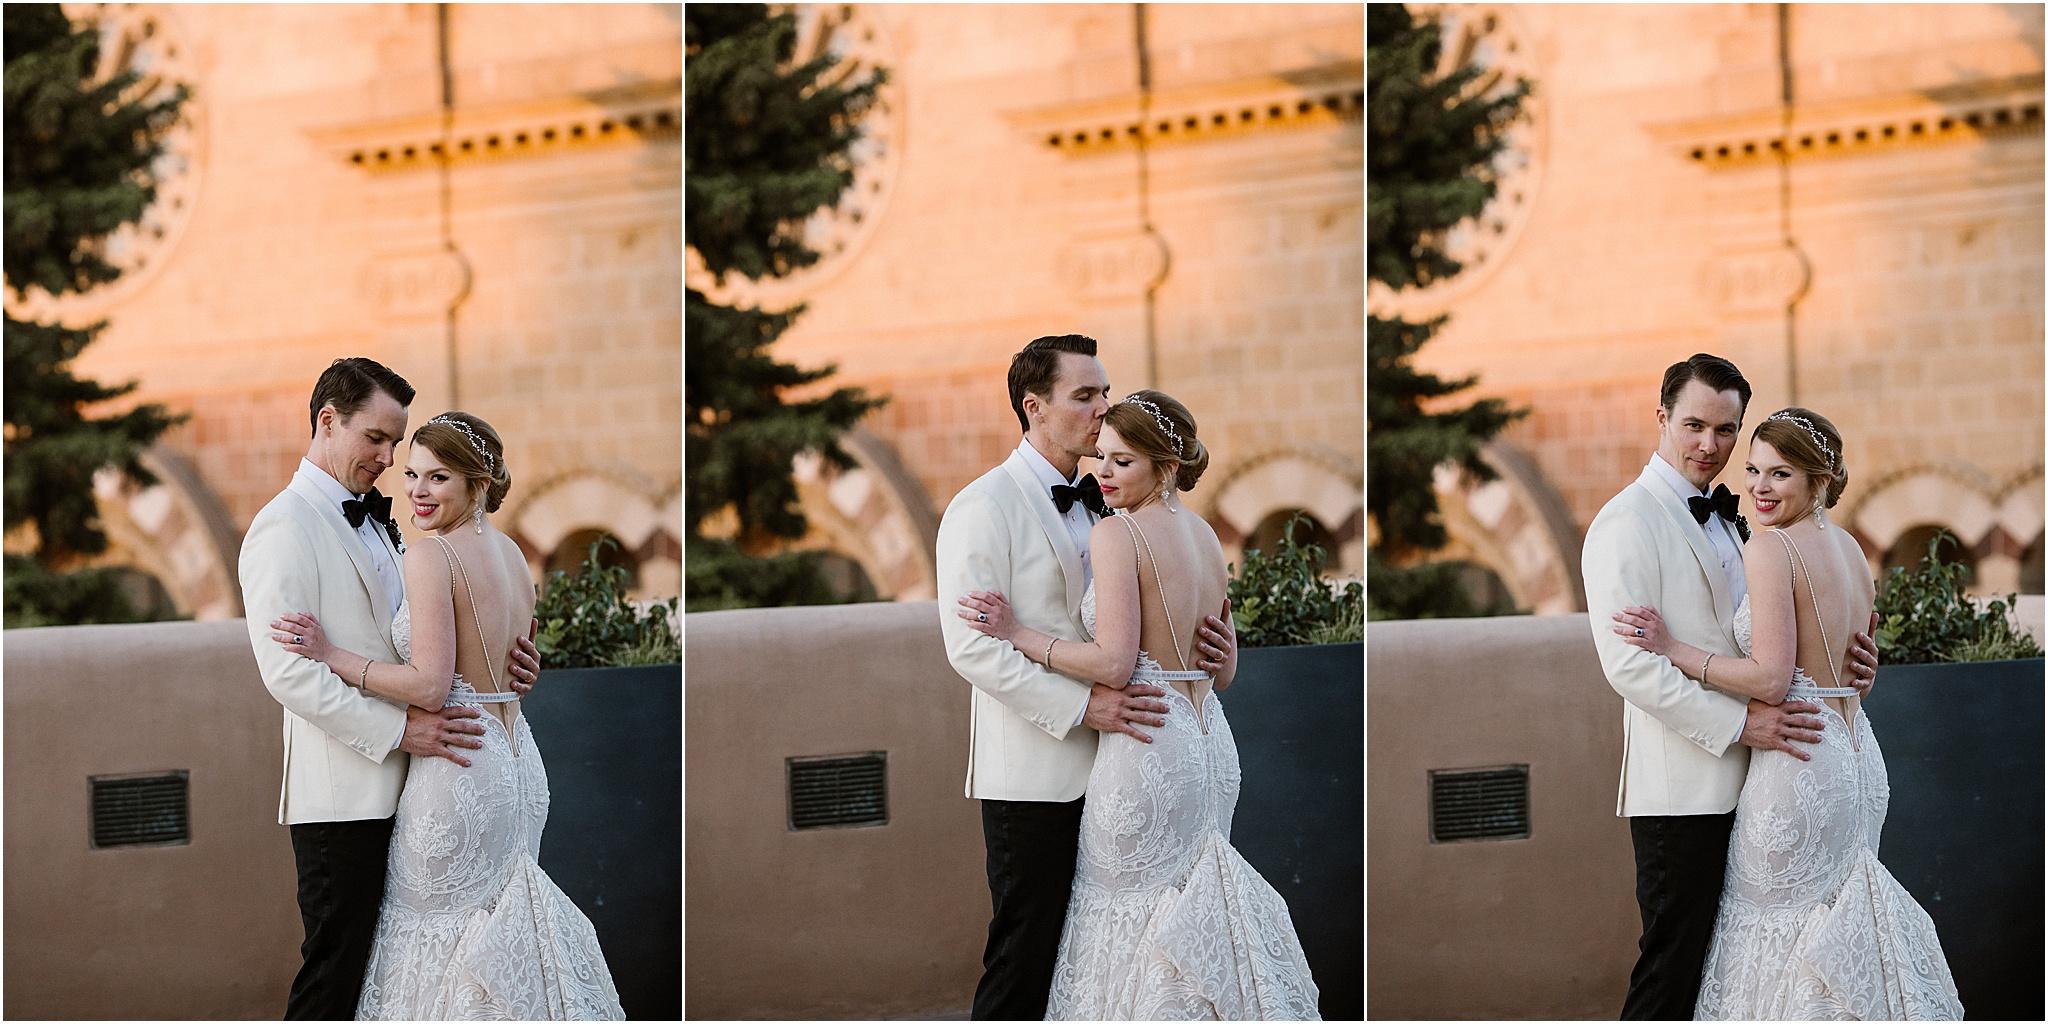 BLUE ROSE PHOTOGRAPHY SANTA FE WEDDING_52